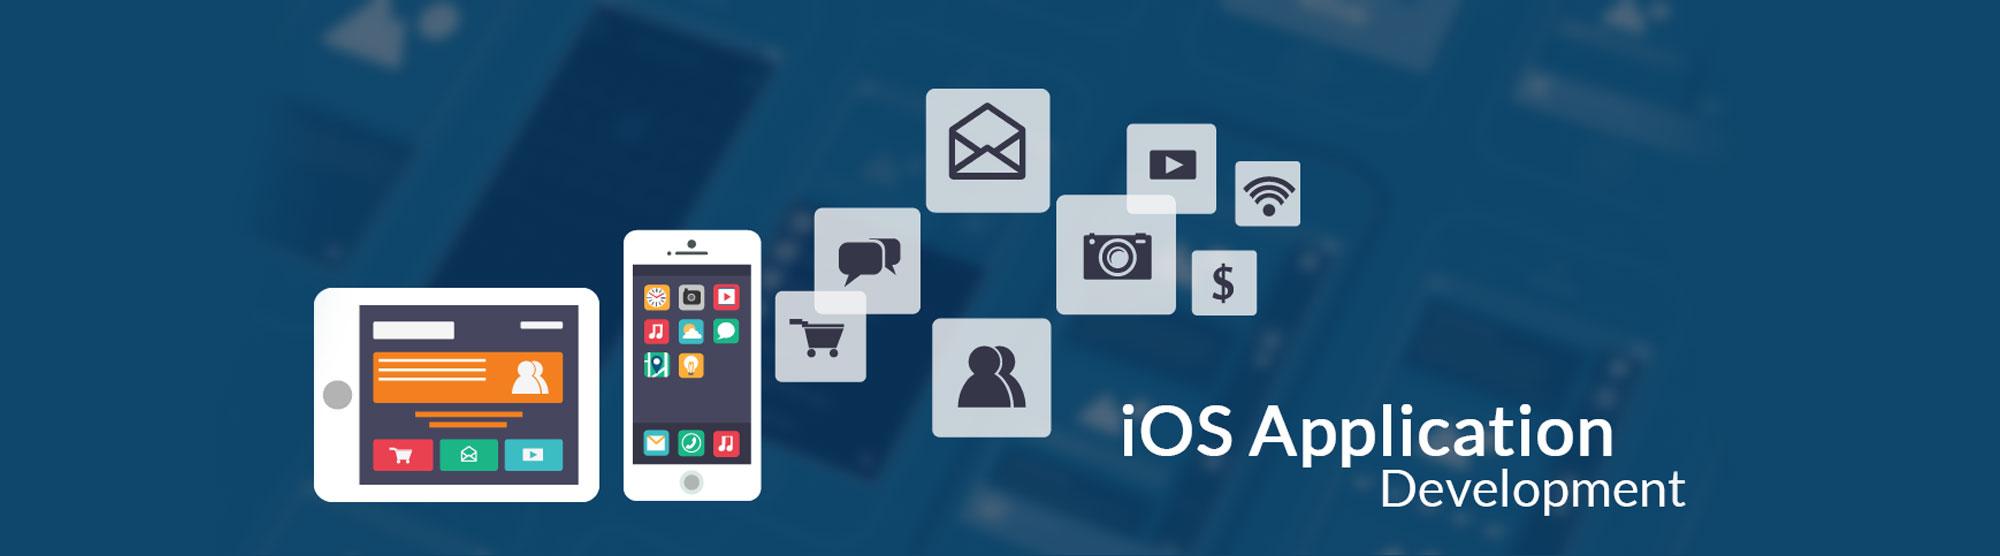 IOS app development: where to start 69